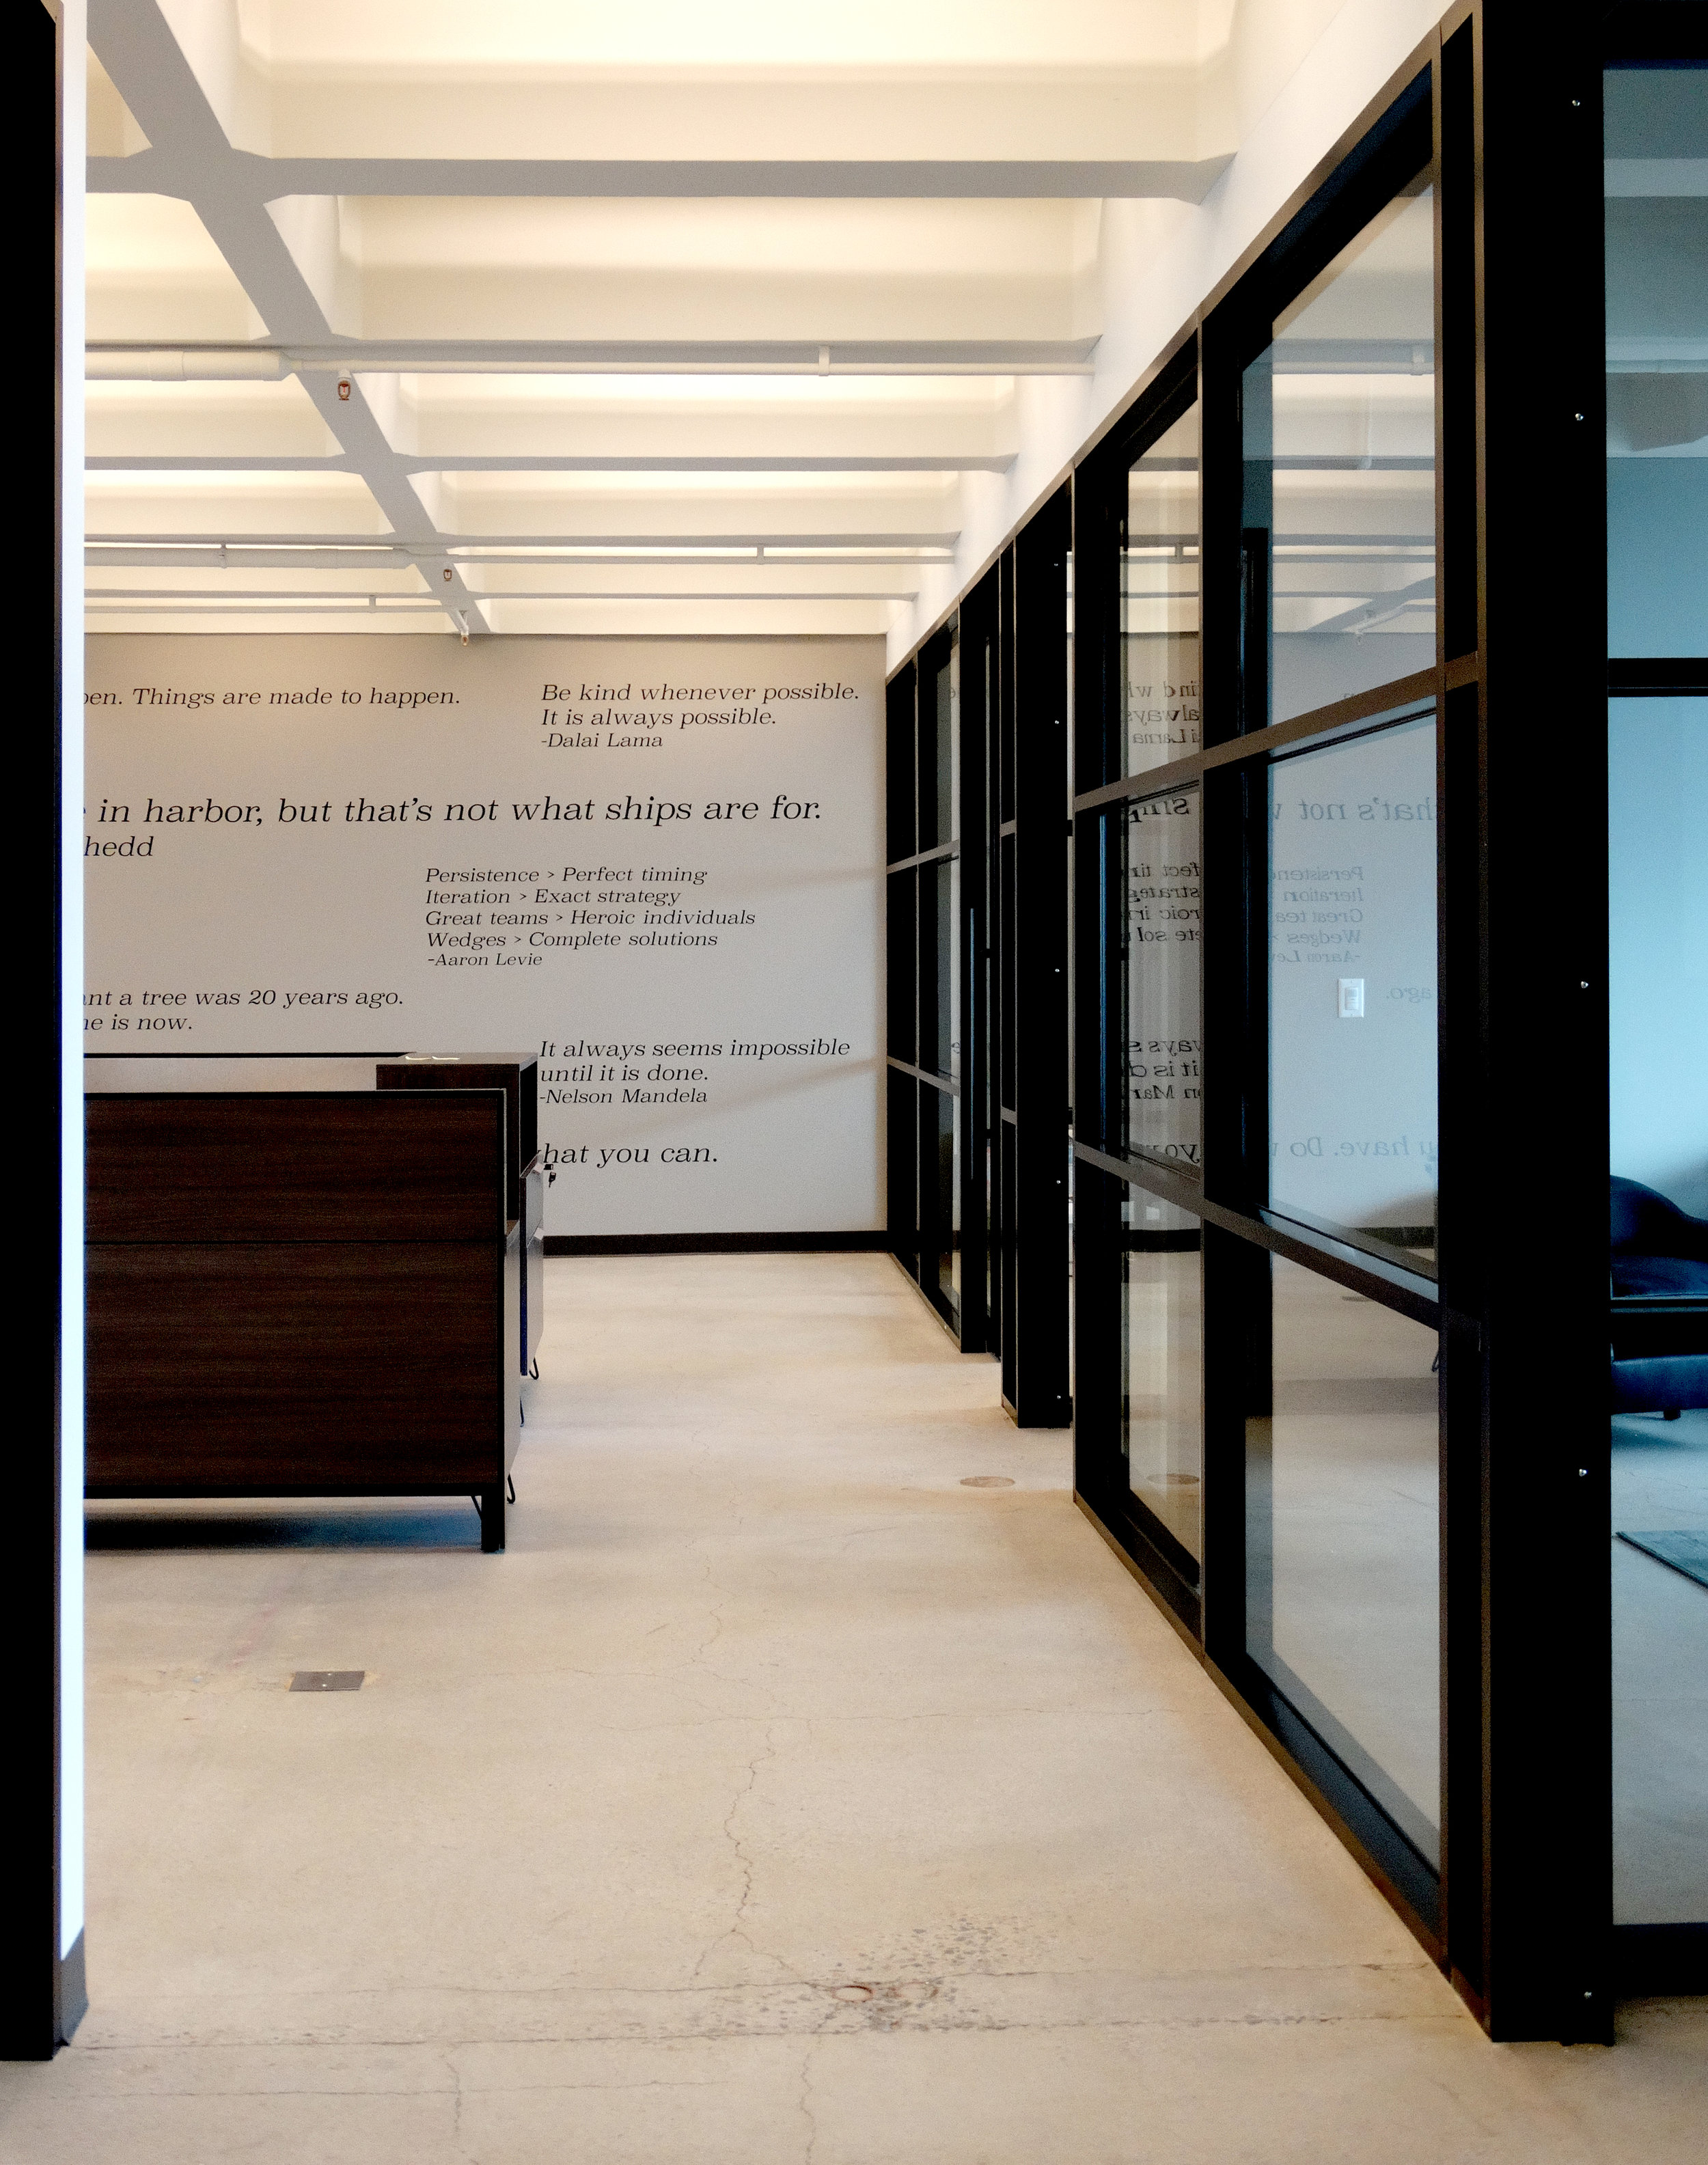 Encase Glass Statement Wall Black Aluminum Mullion System - Spaceworks AI.JPG